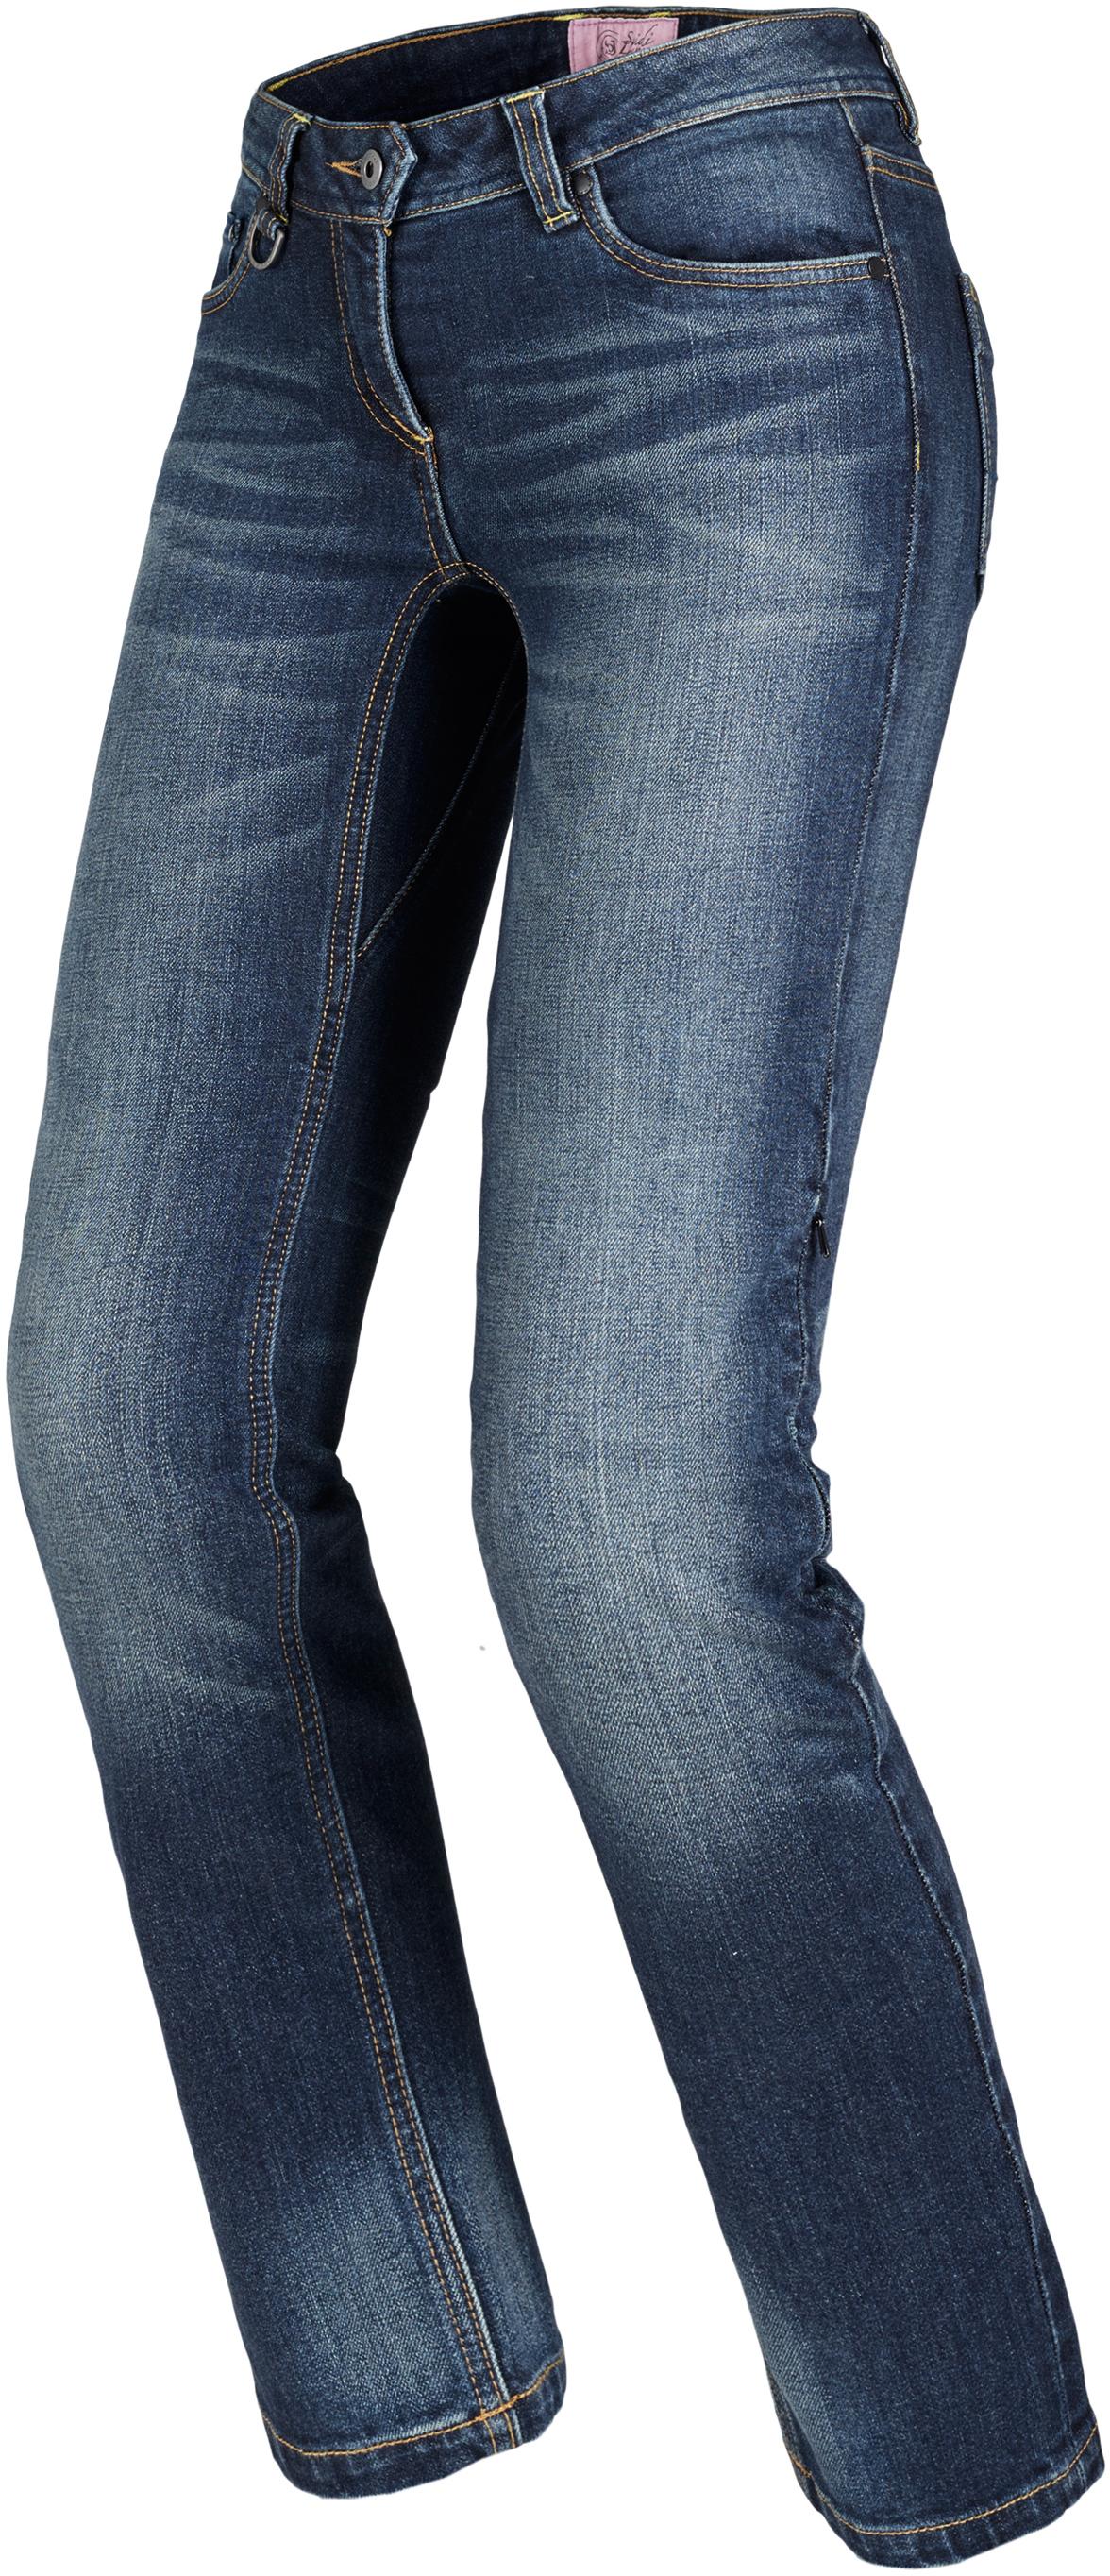 Spidi J-Tracker Pantalón Mujer Azul Oscuro 29